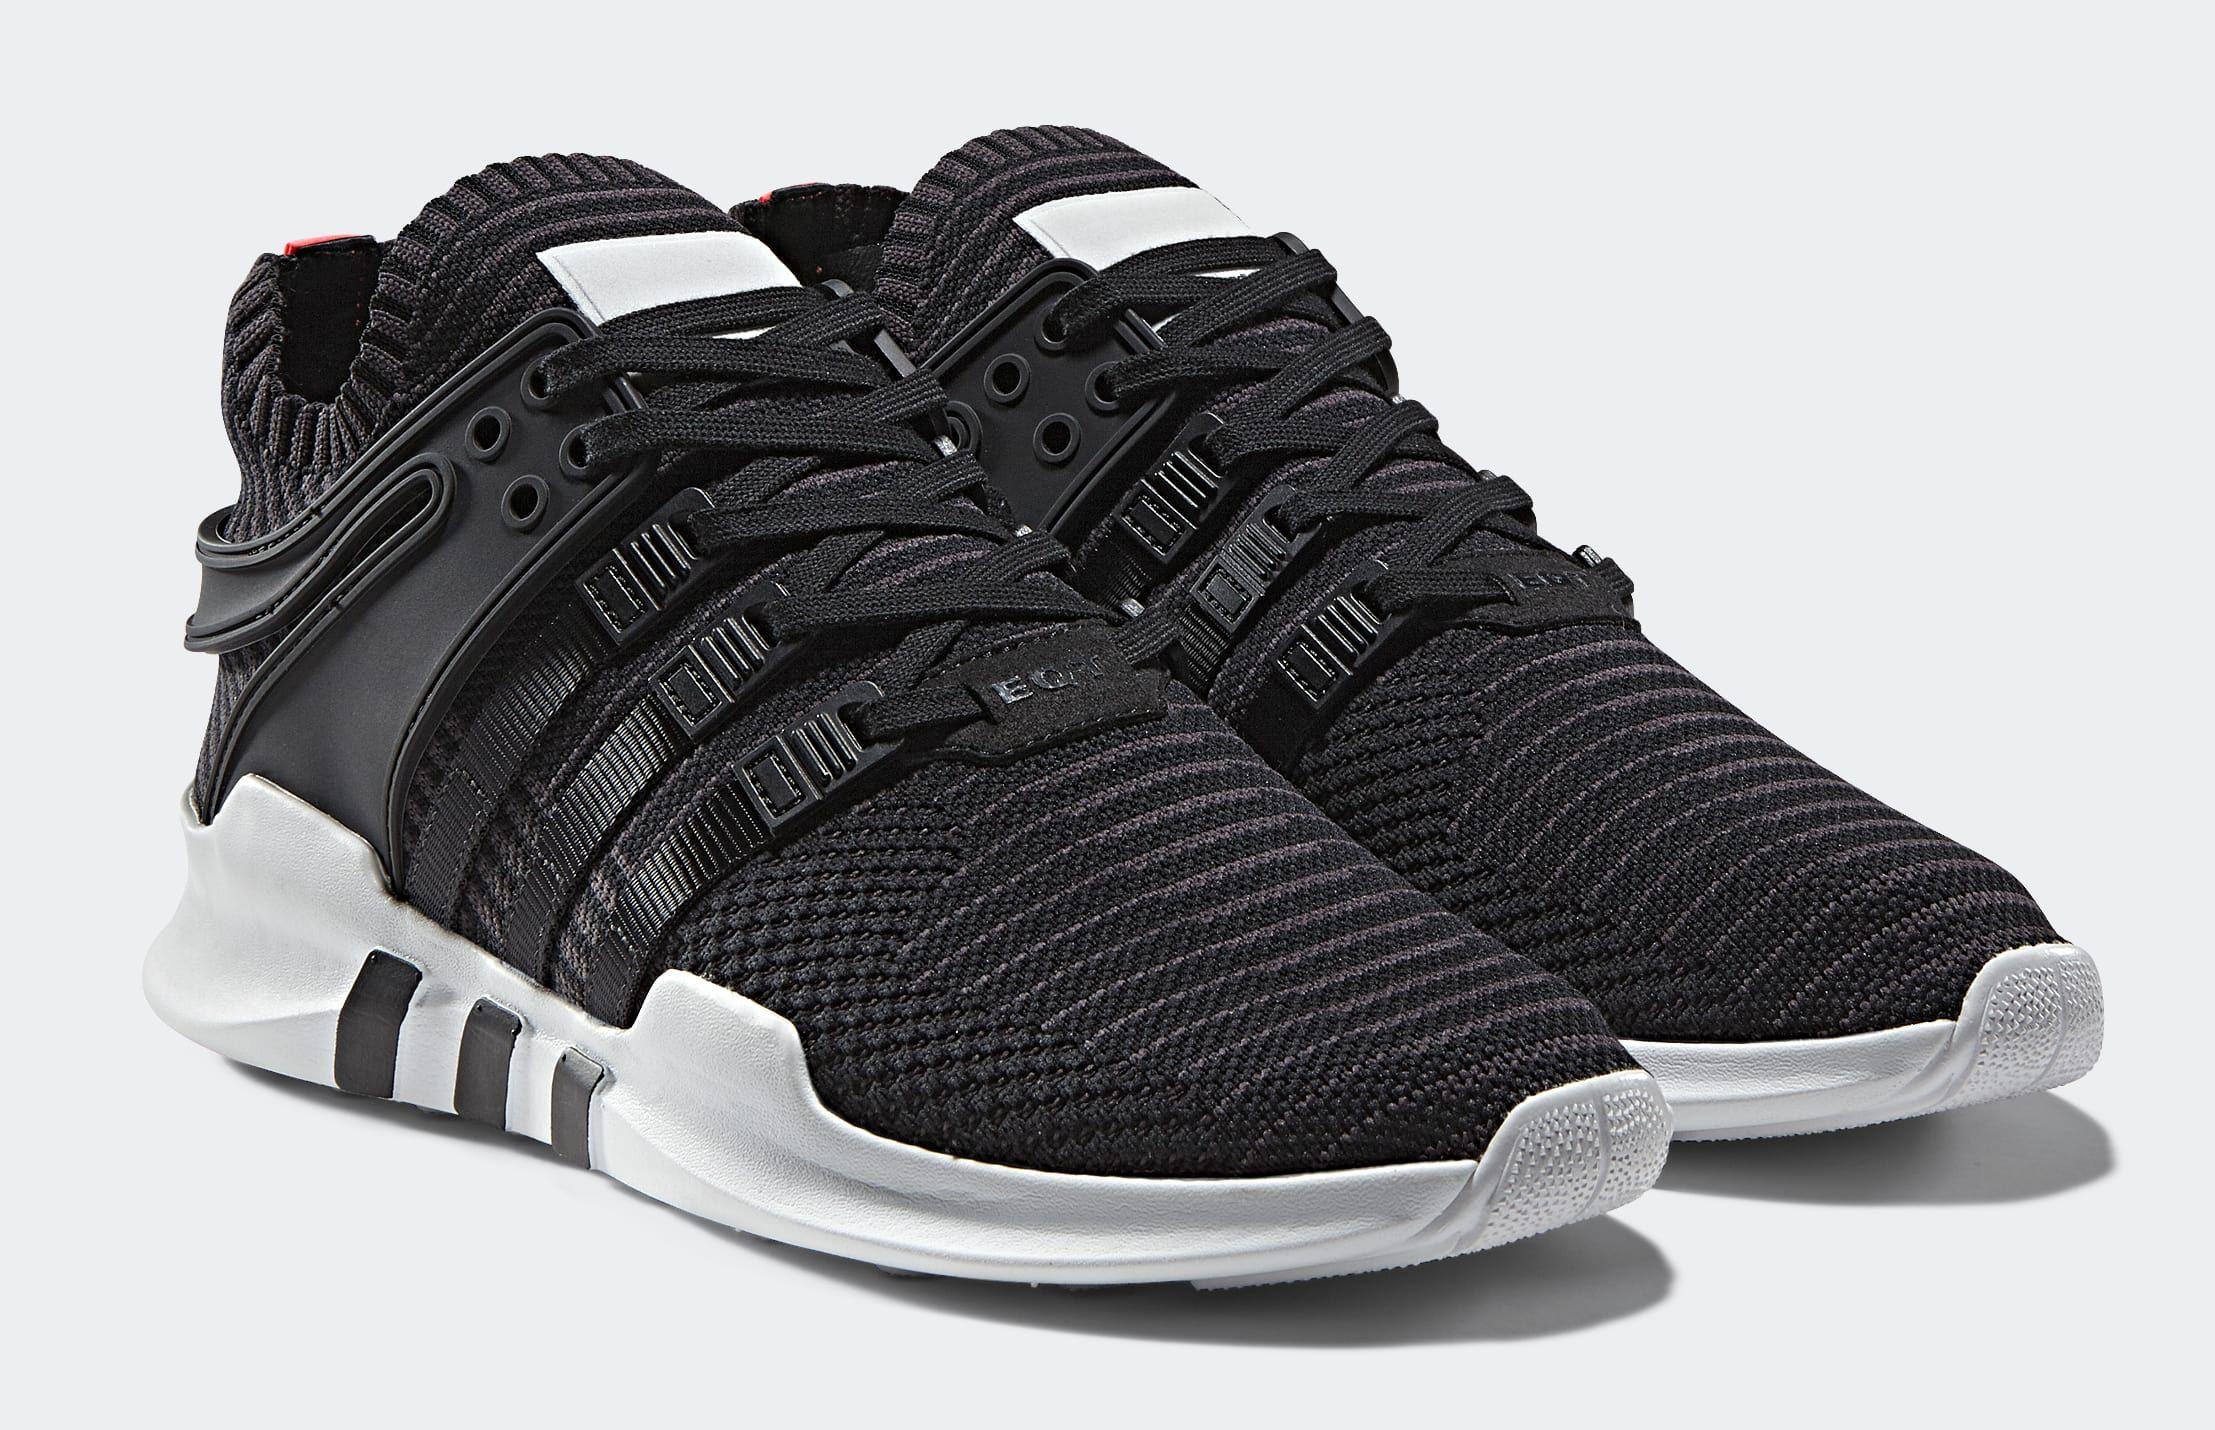 Adidas EQT Support ADV Primeknit